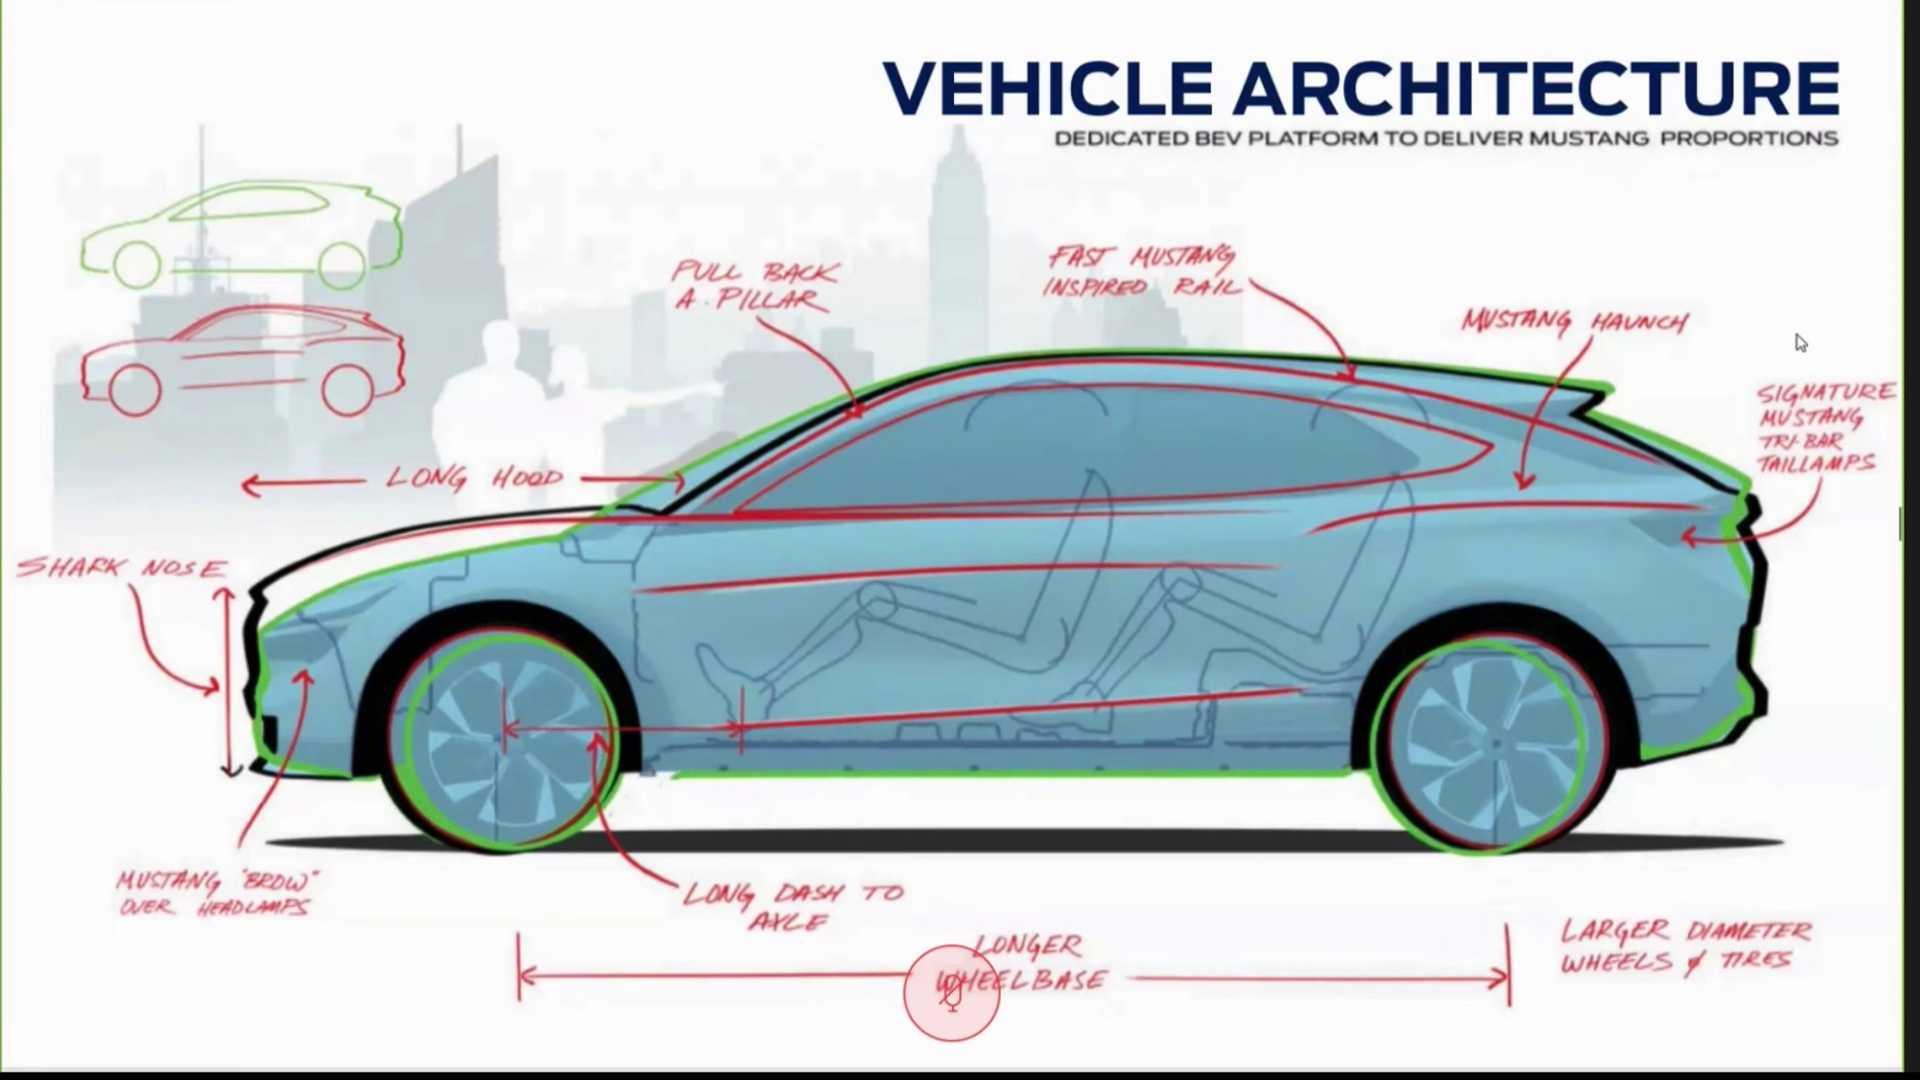 Ford-Mustang-Mach-E-Design-Process-Presentation-8